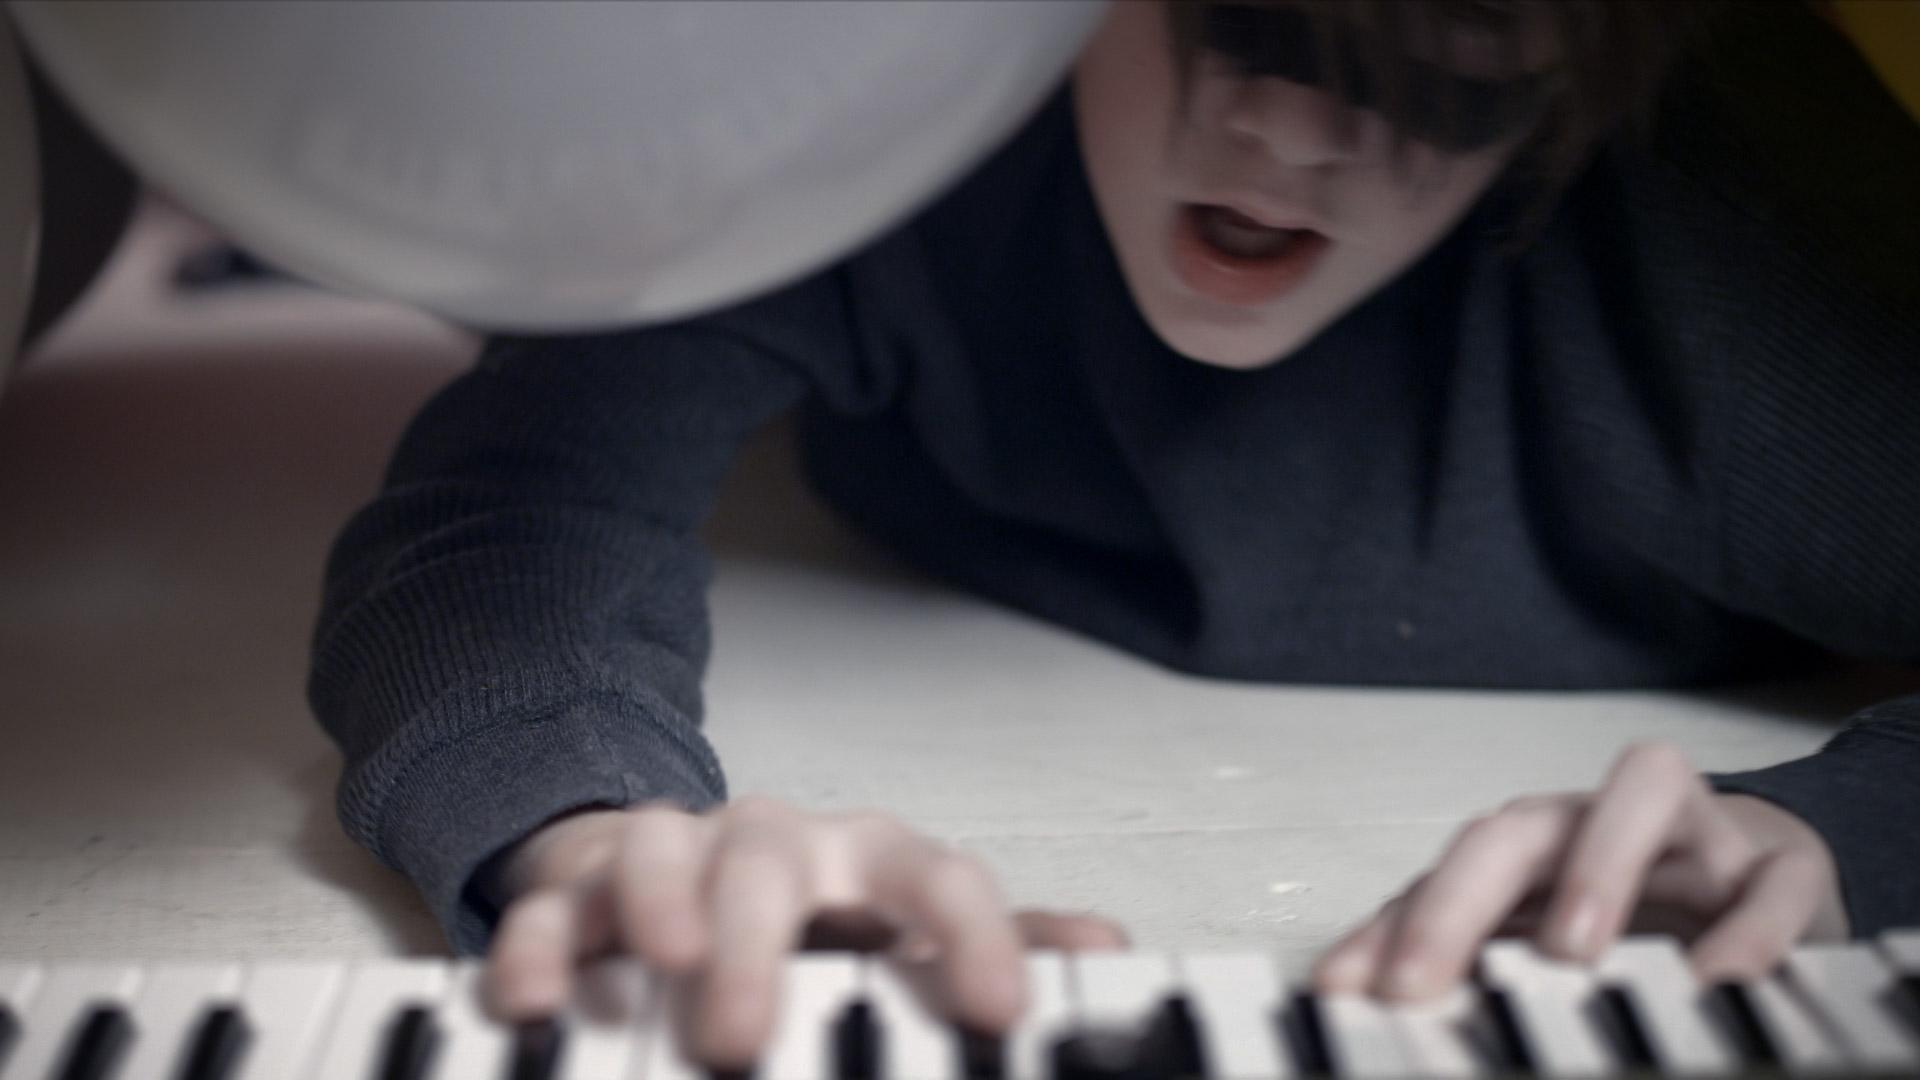 Copy of MyCountry_musicvideo_still